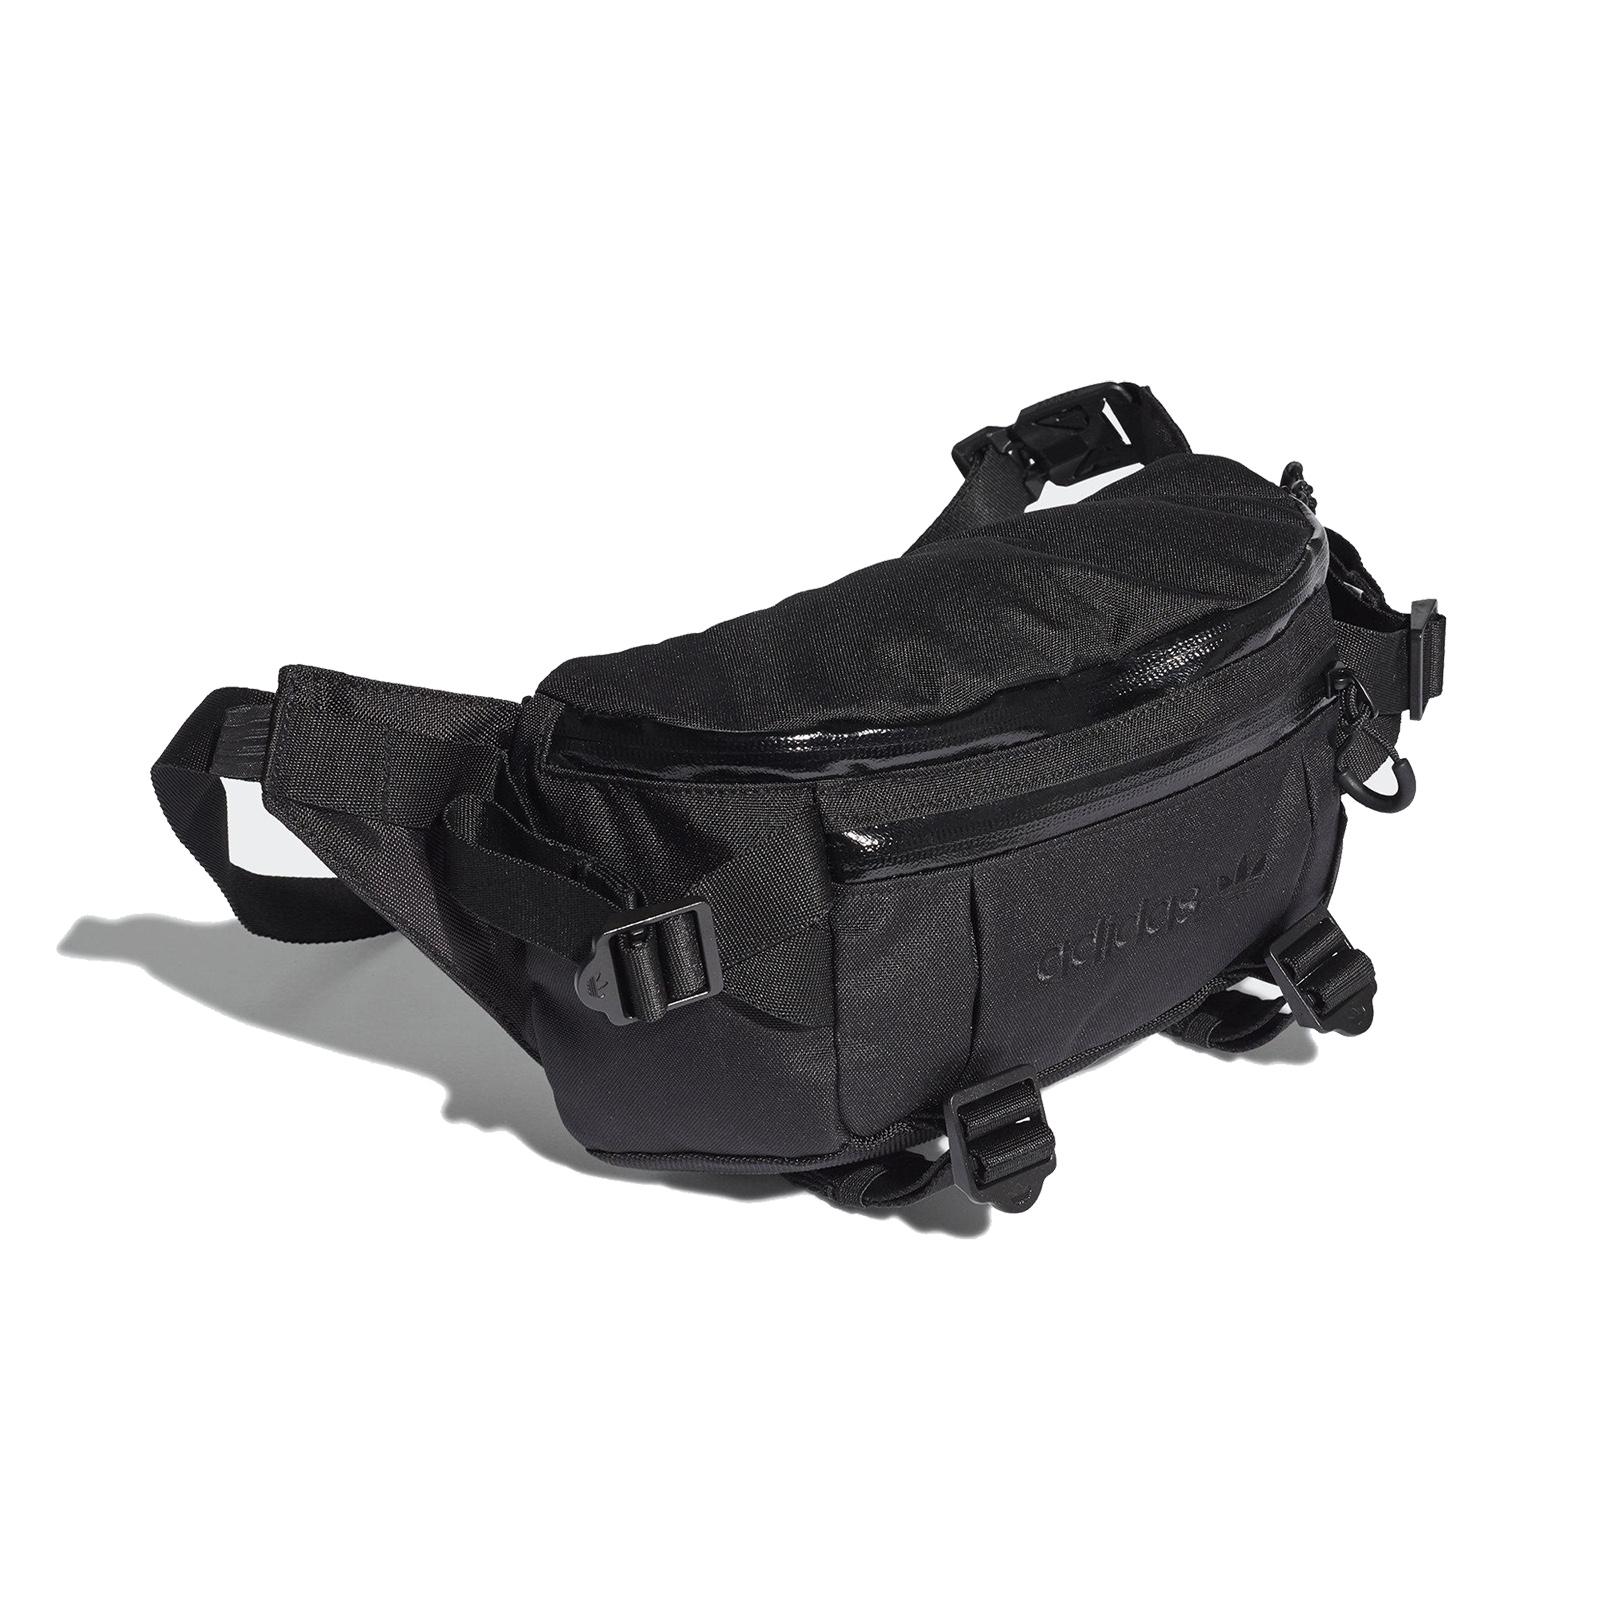 adidas 腰包 Adventure Waist Bag 全黑 男女款 可調整 包包 愛迪達【ACS】 GD5013